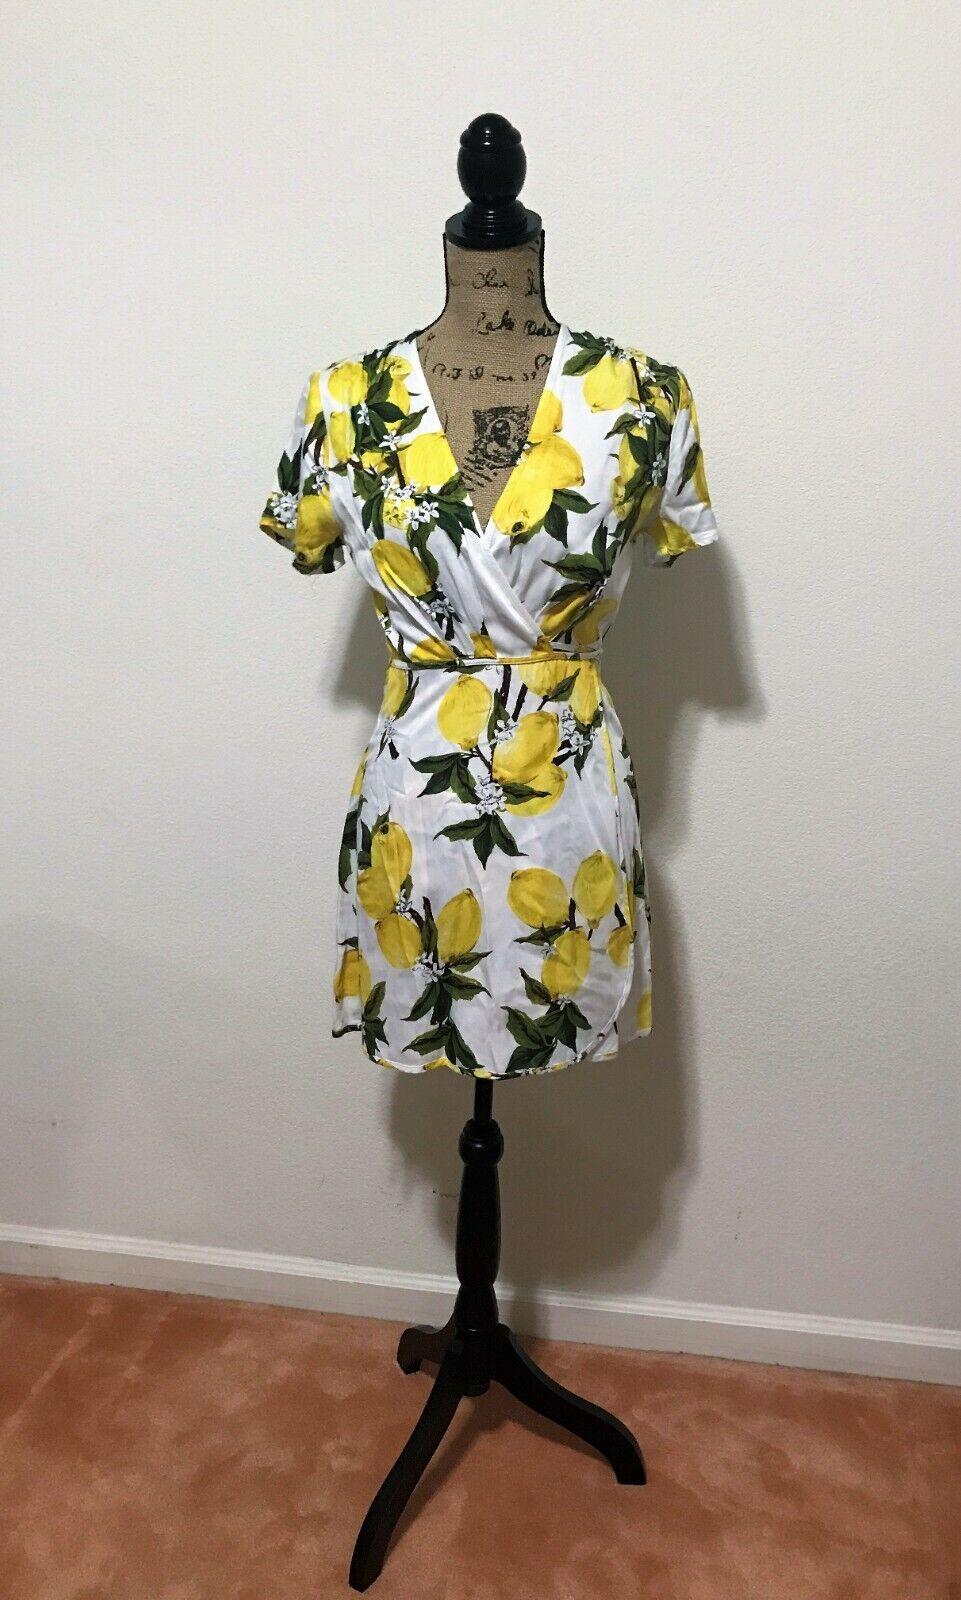 NWT Dress Forum Los Angeles Lemon Blossom Print Weiß Tie Wrap Summer Sundress S